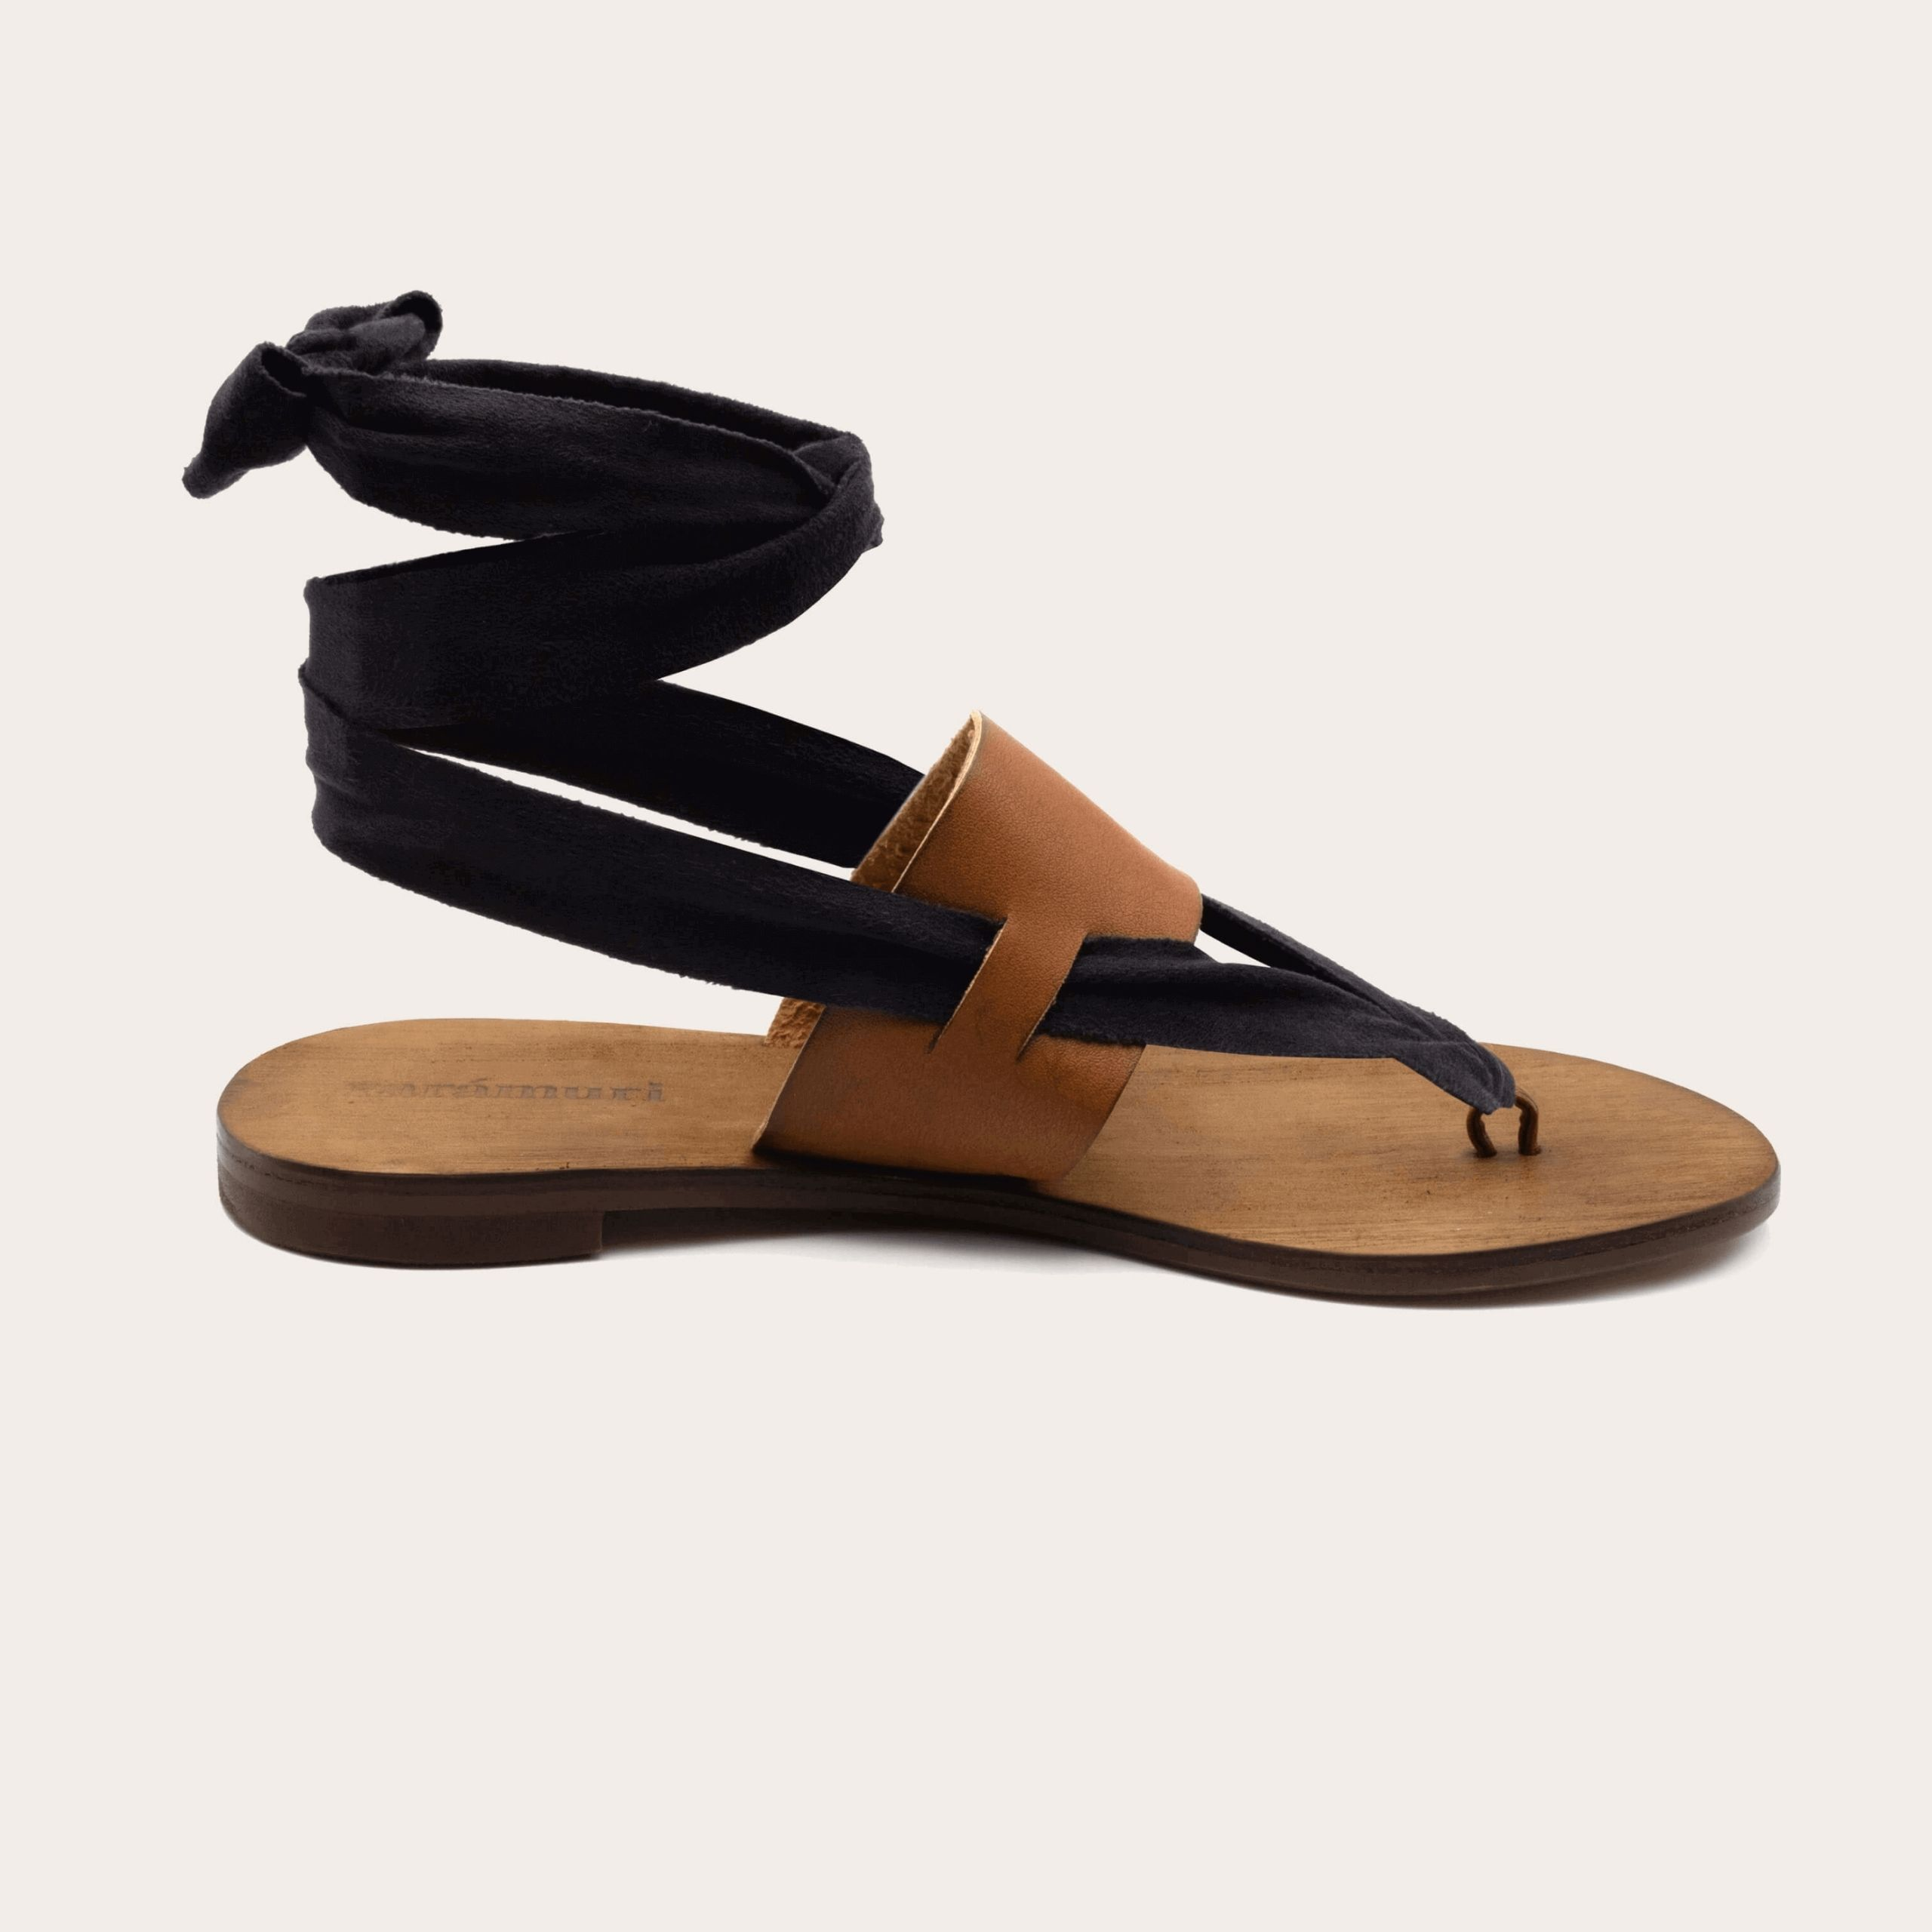 cabo_1_lintsandalen sandals travelsandals vegan sustainable sandals wikkelsandalen